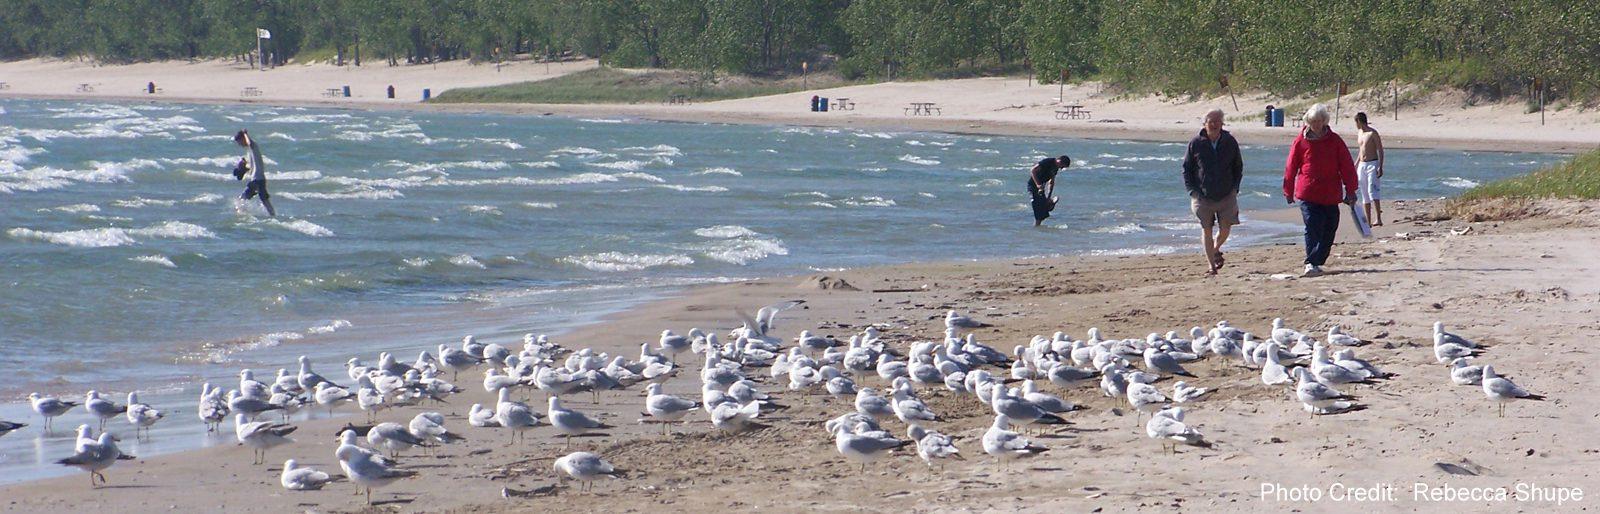 Quinte - Sandbanks Provincial Park - Lake Ontario - sliver (Rebecca Shupe)